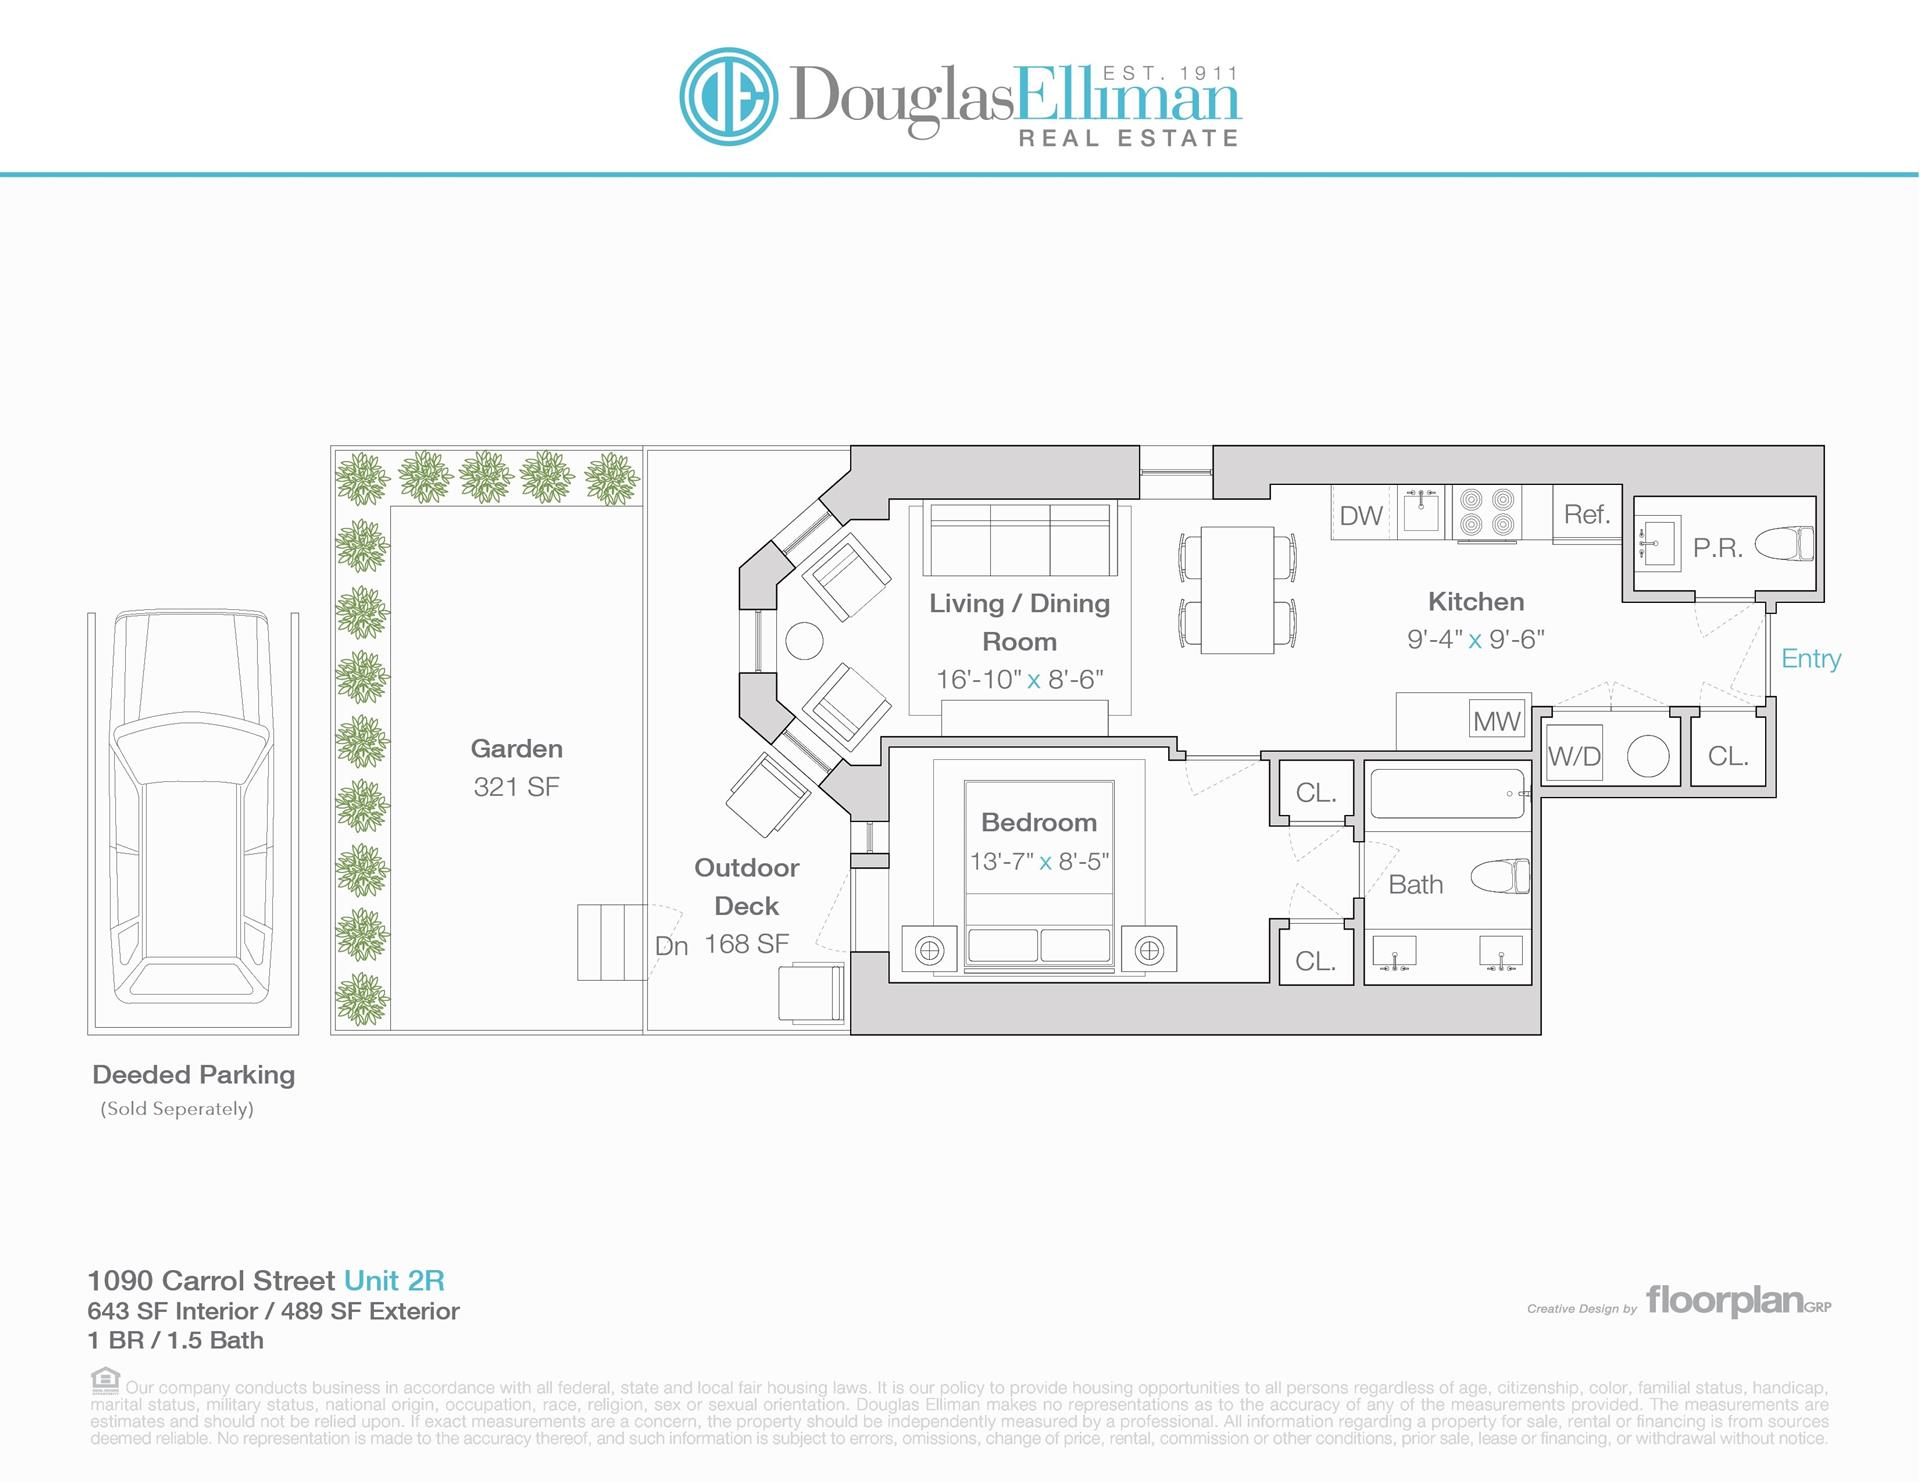 Floor plan of 1090 Carroll Street, 2R - Crown Heights, New York